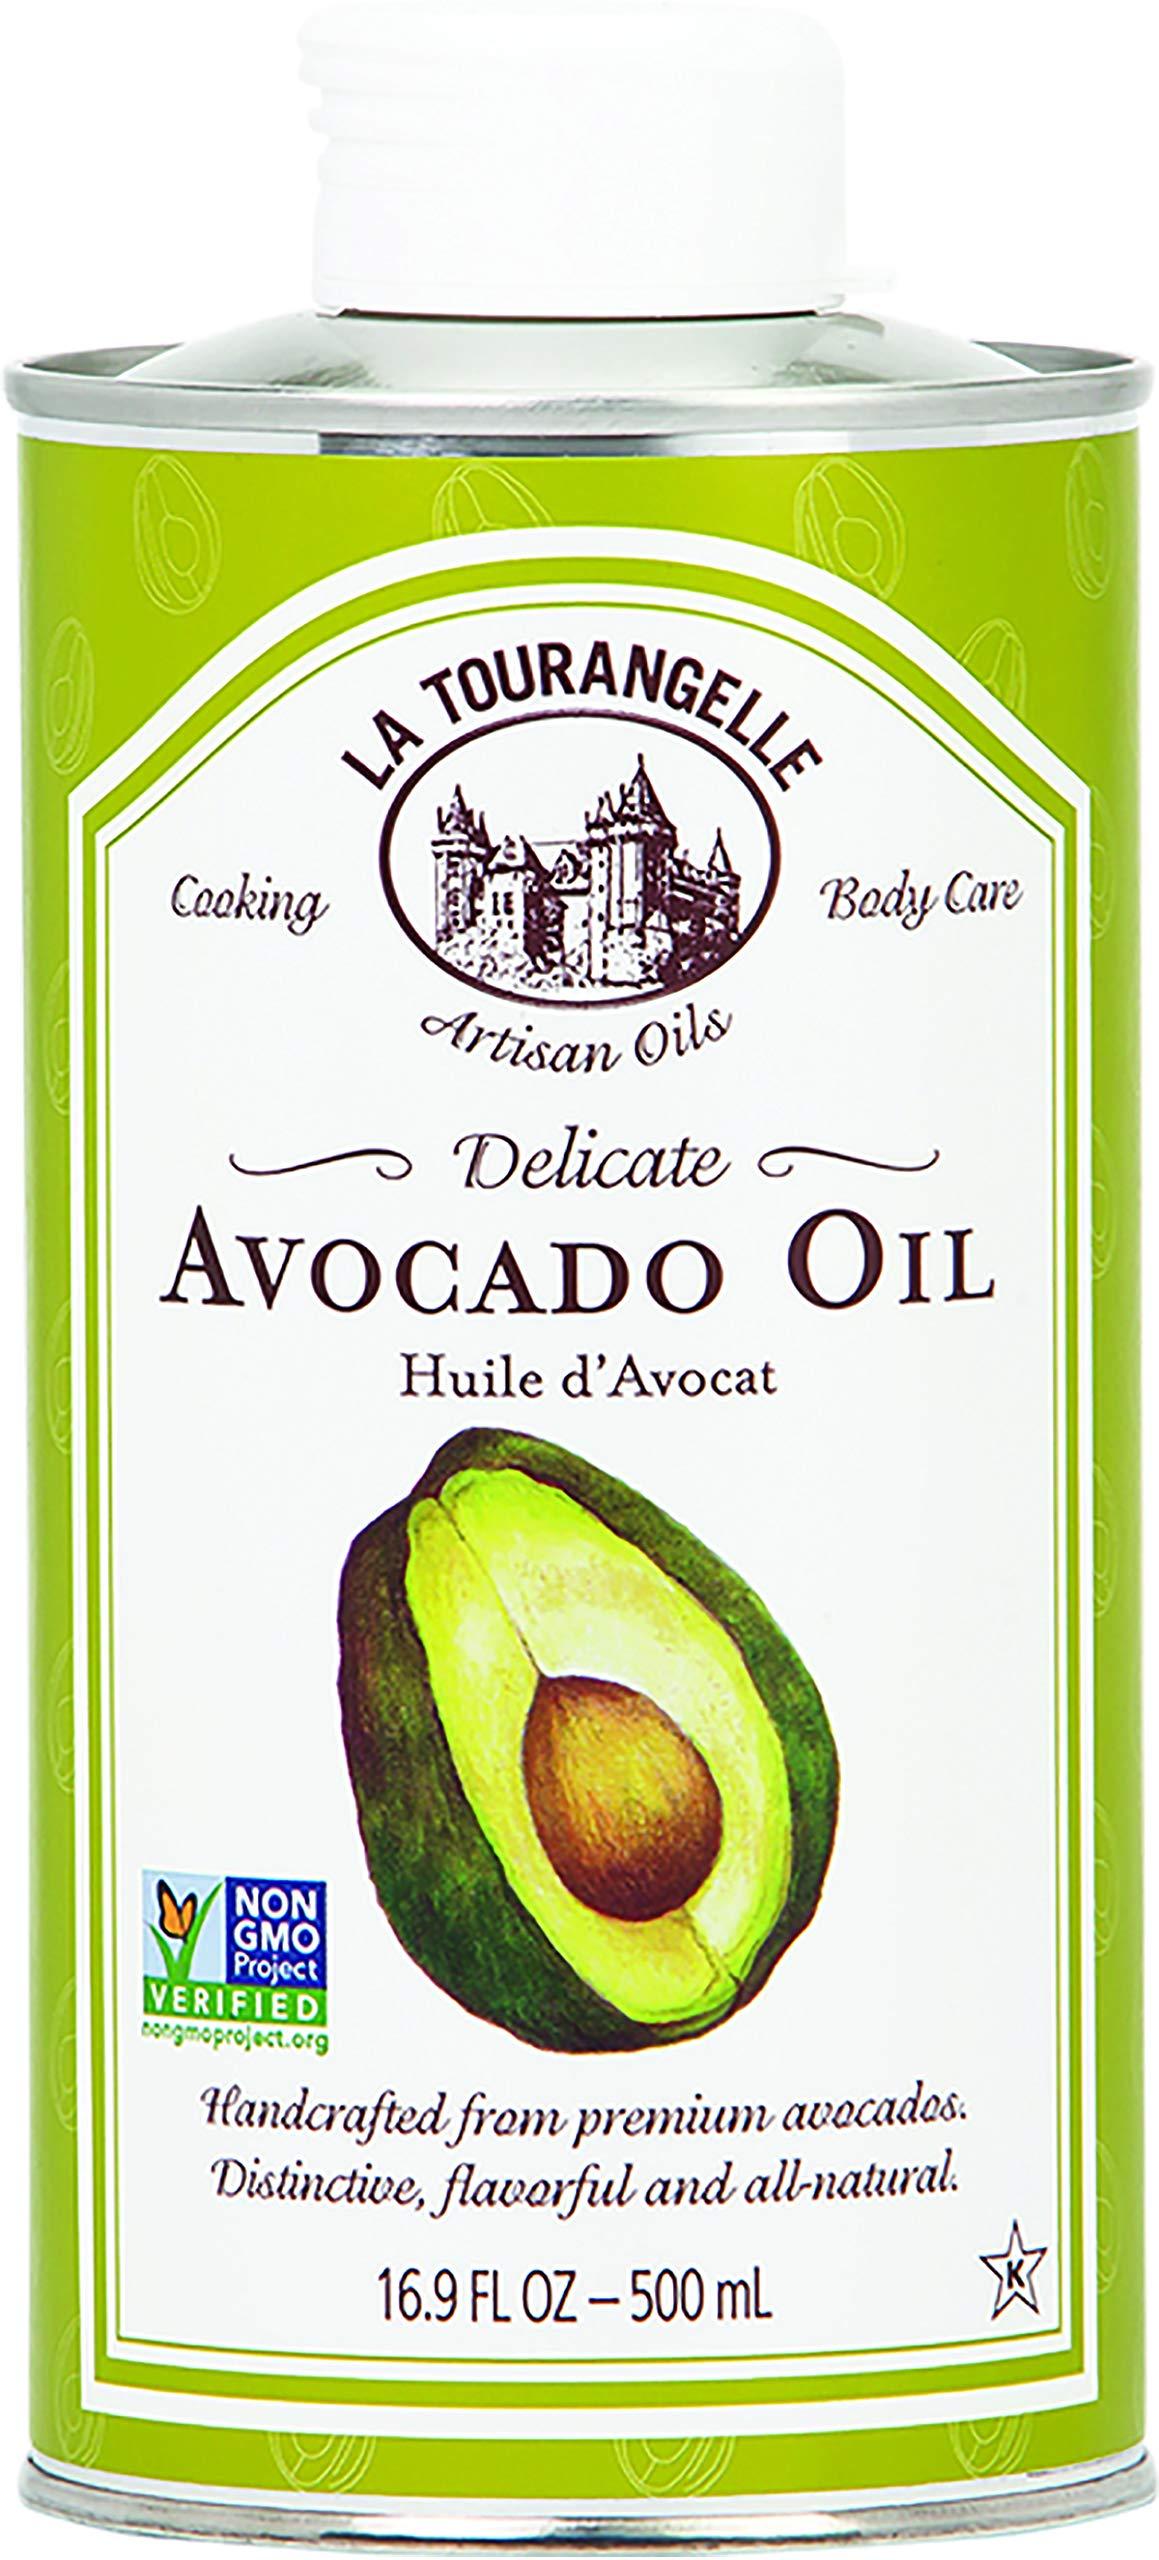 La Tourangelle Avocado Oil 16.9 Fl. Oz., All-Natural, Artisanal, Great for Salads, Fruit, Fish or Vegetables, Buttery Flavor by La Tourangelle